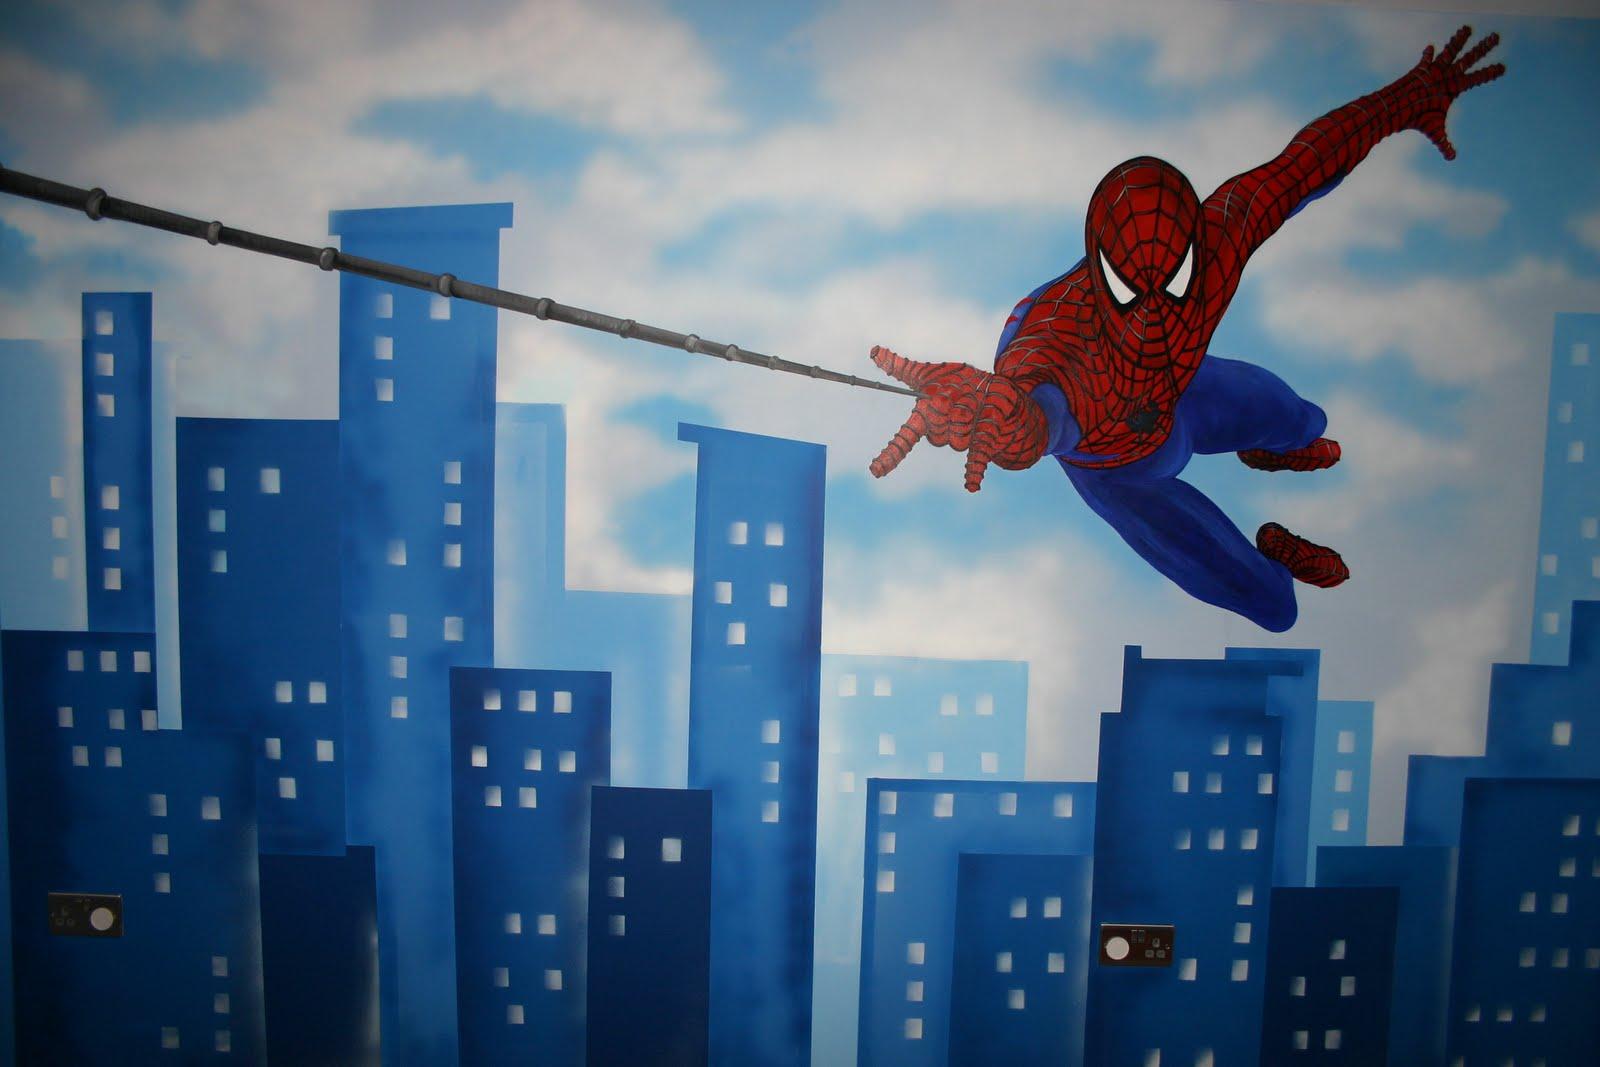 Mural designs the muralist spiderman wall mural for Background mural